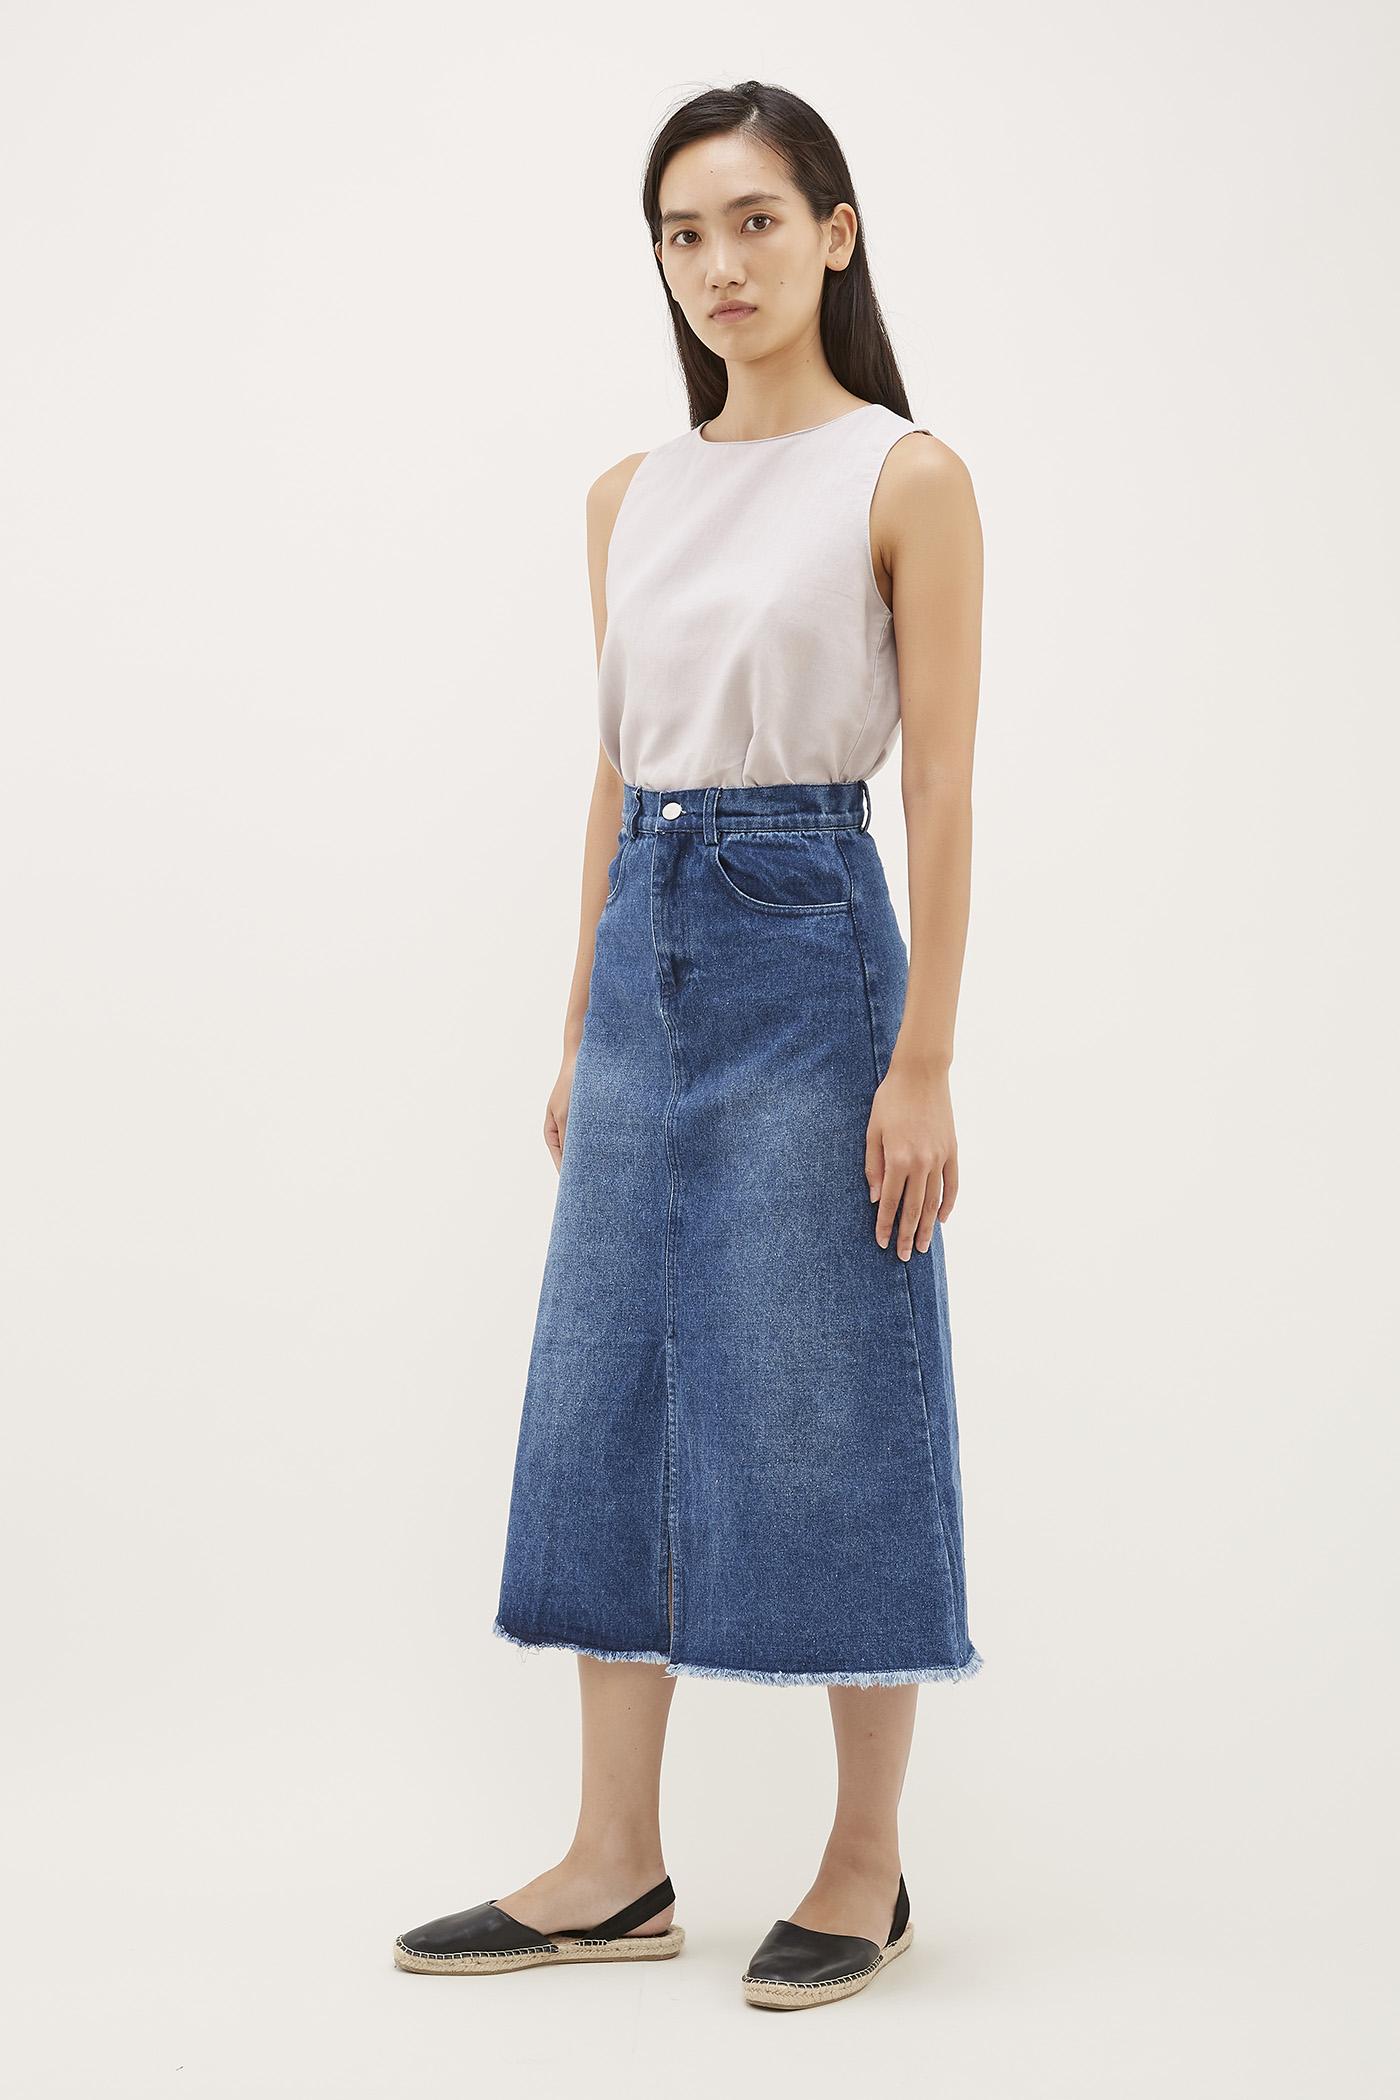 Adda Denim Skirt